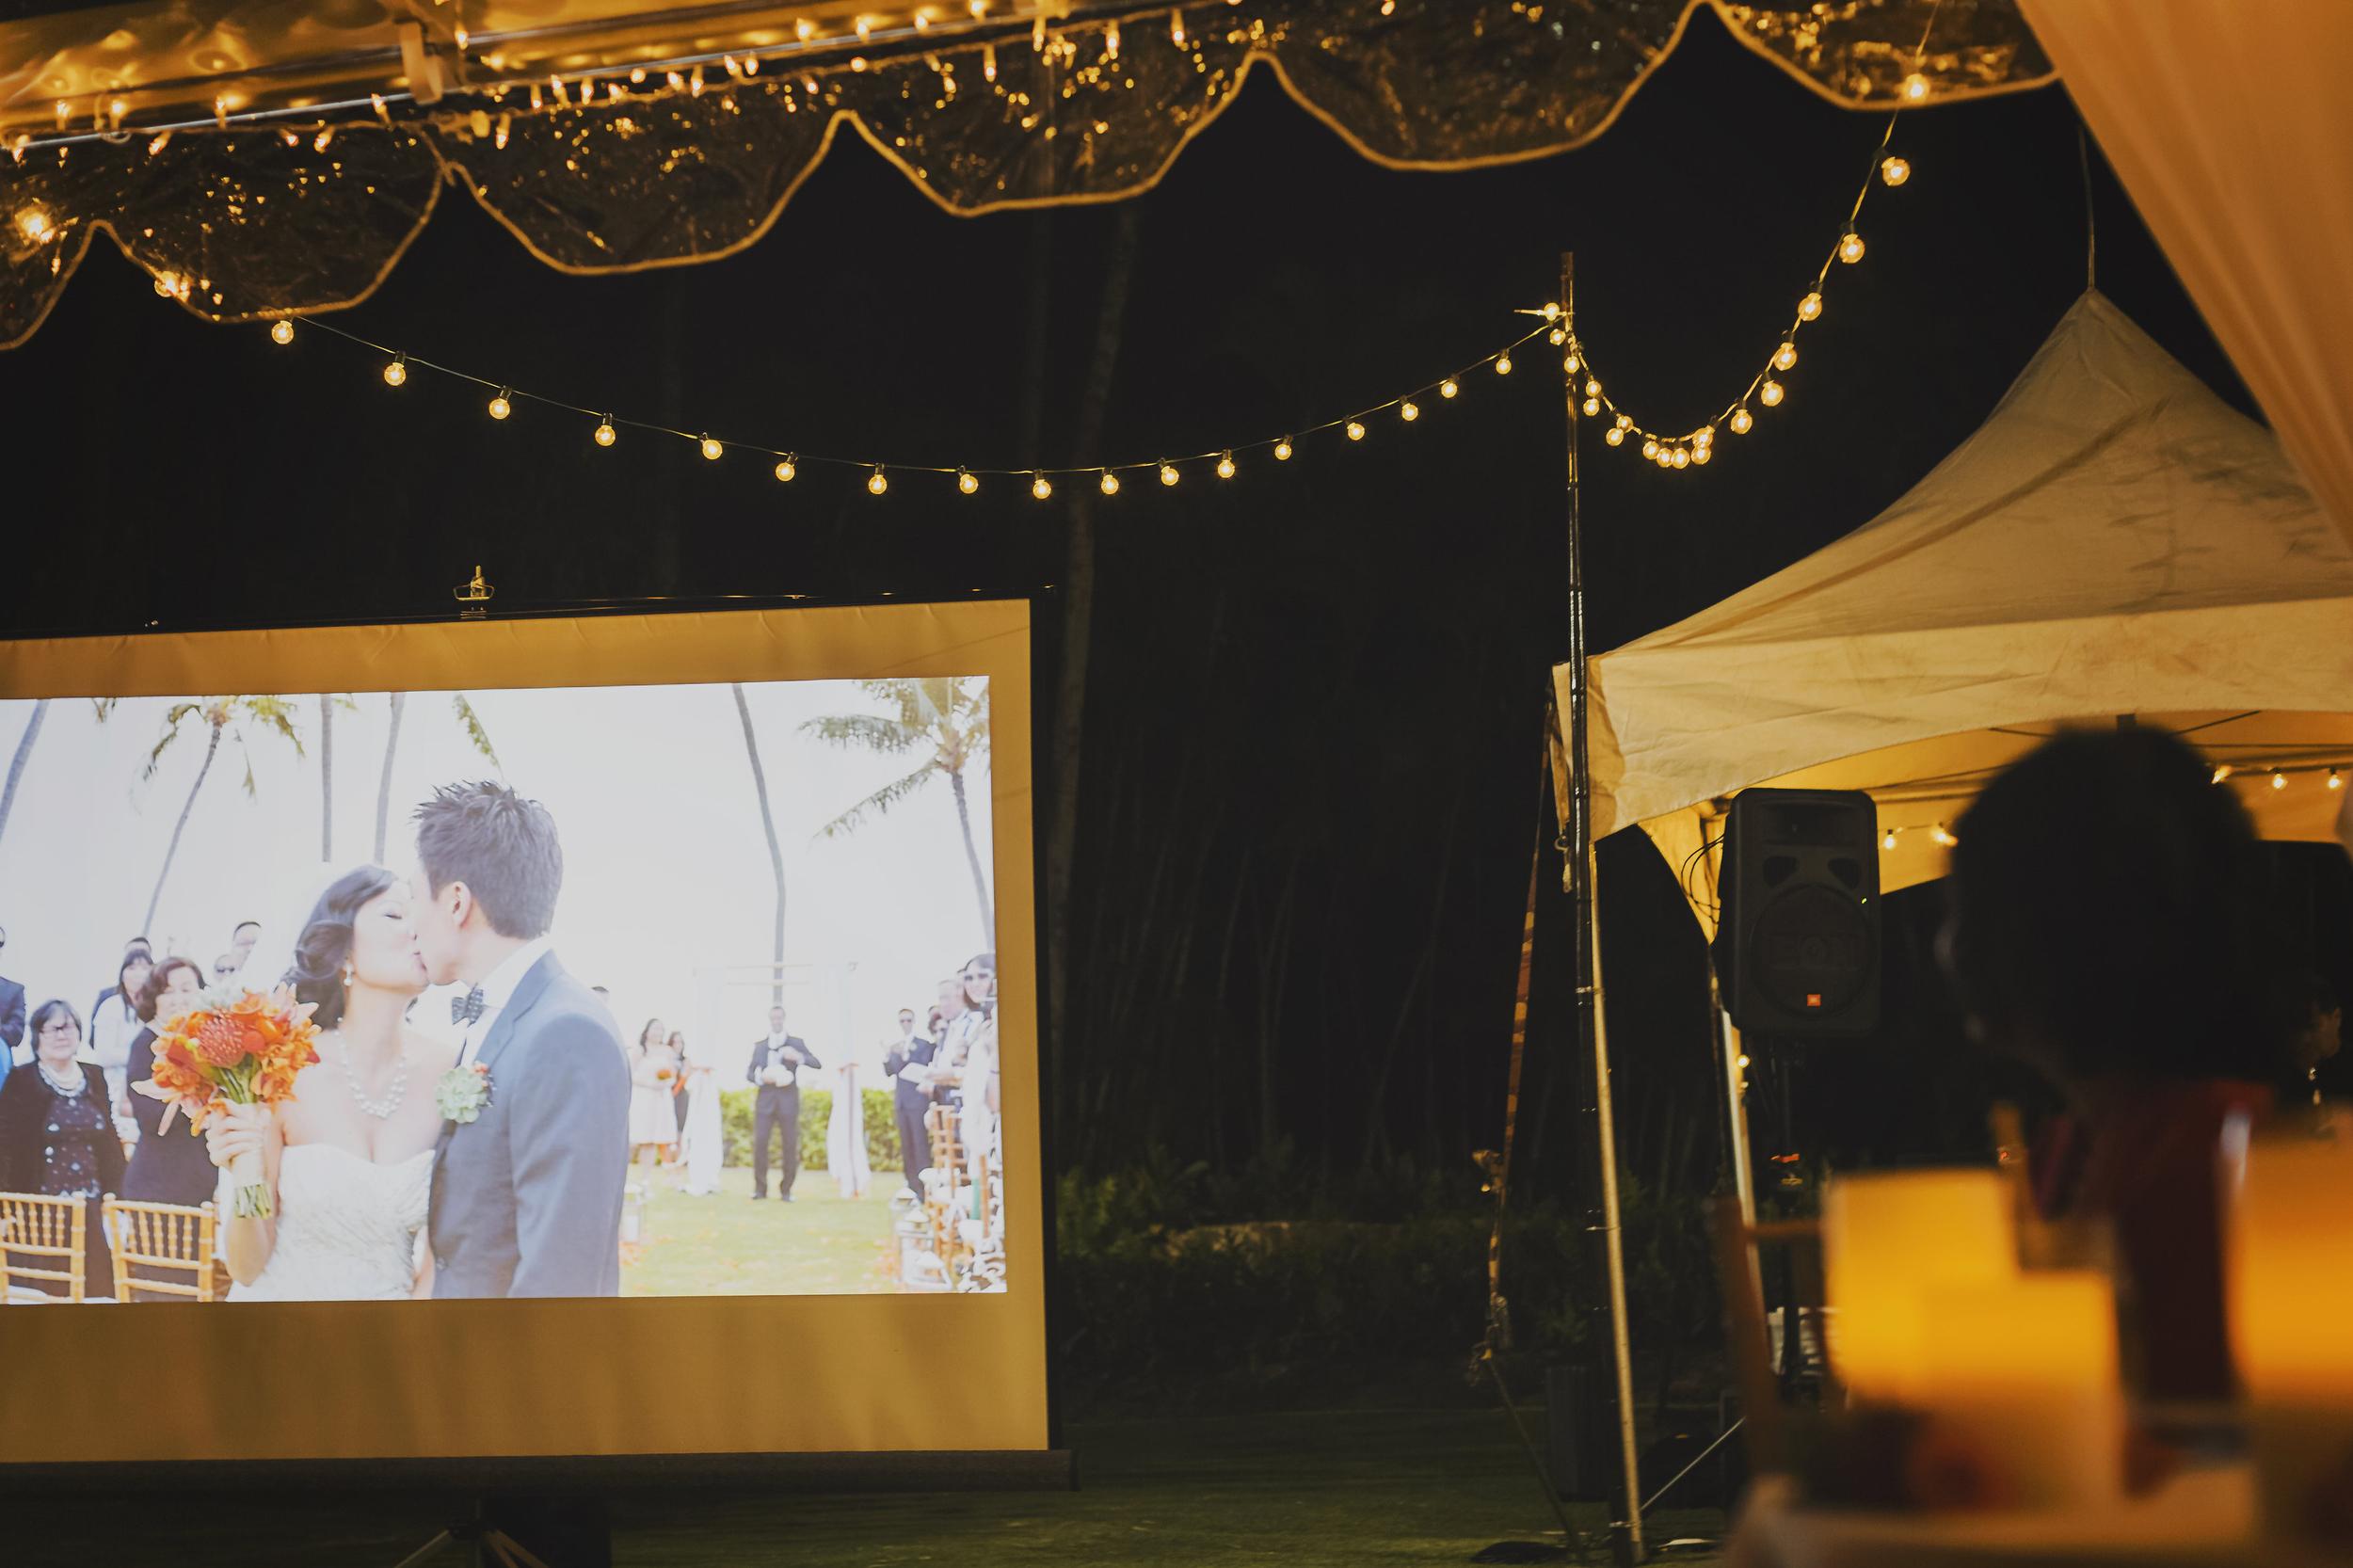 angie-diaz-photography-oahu-wedding-lanikuhonoa-shenshen-marshall-63.jpg